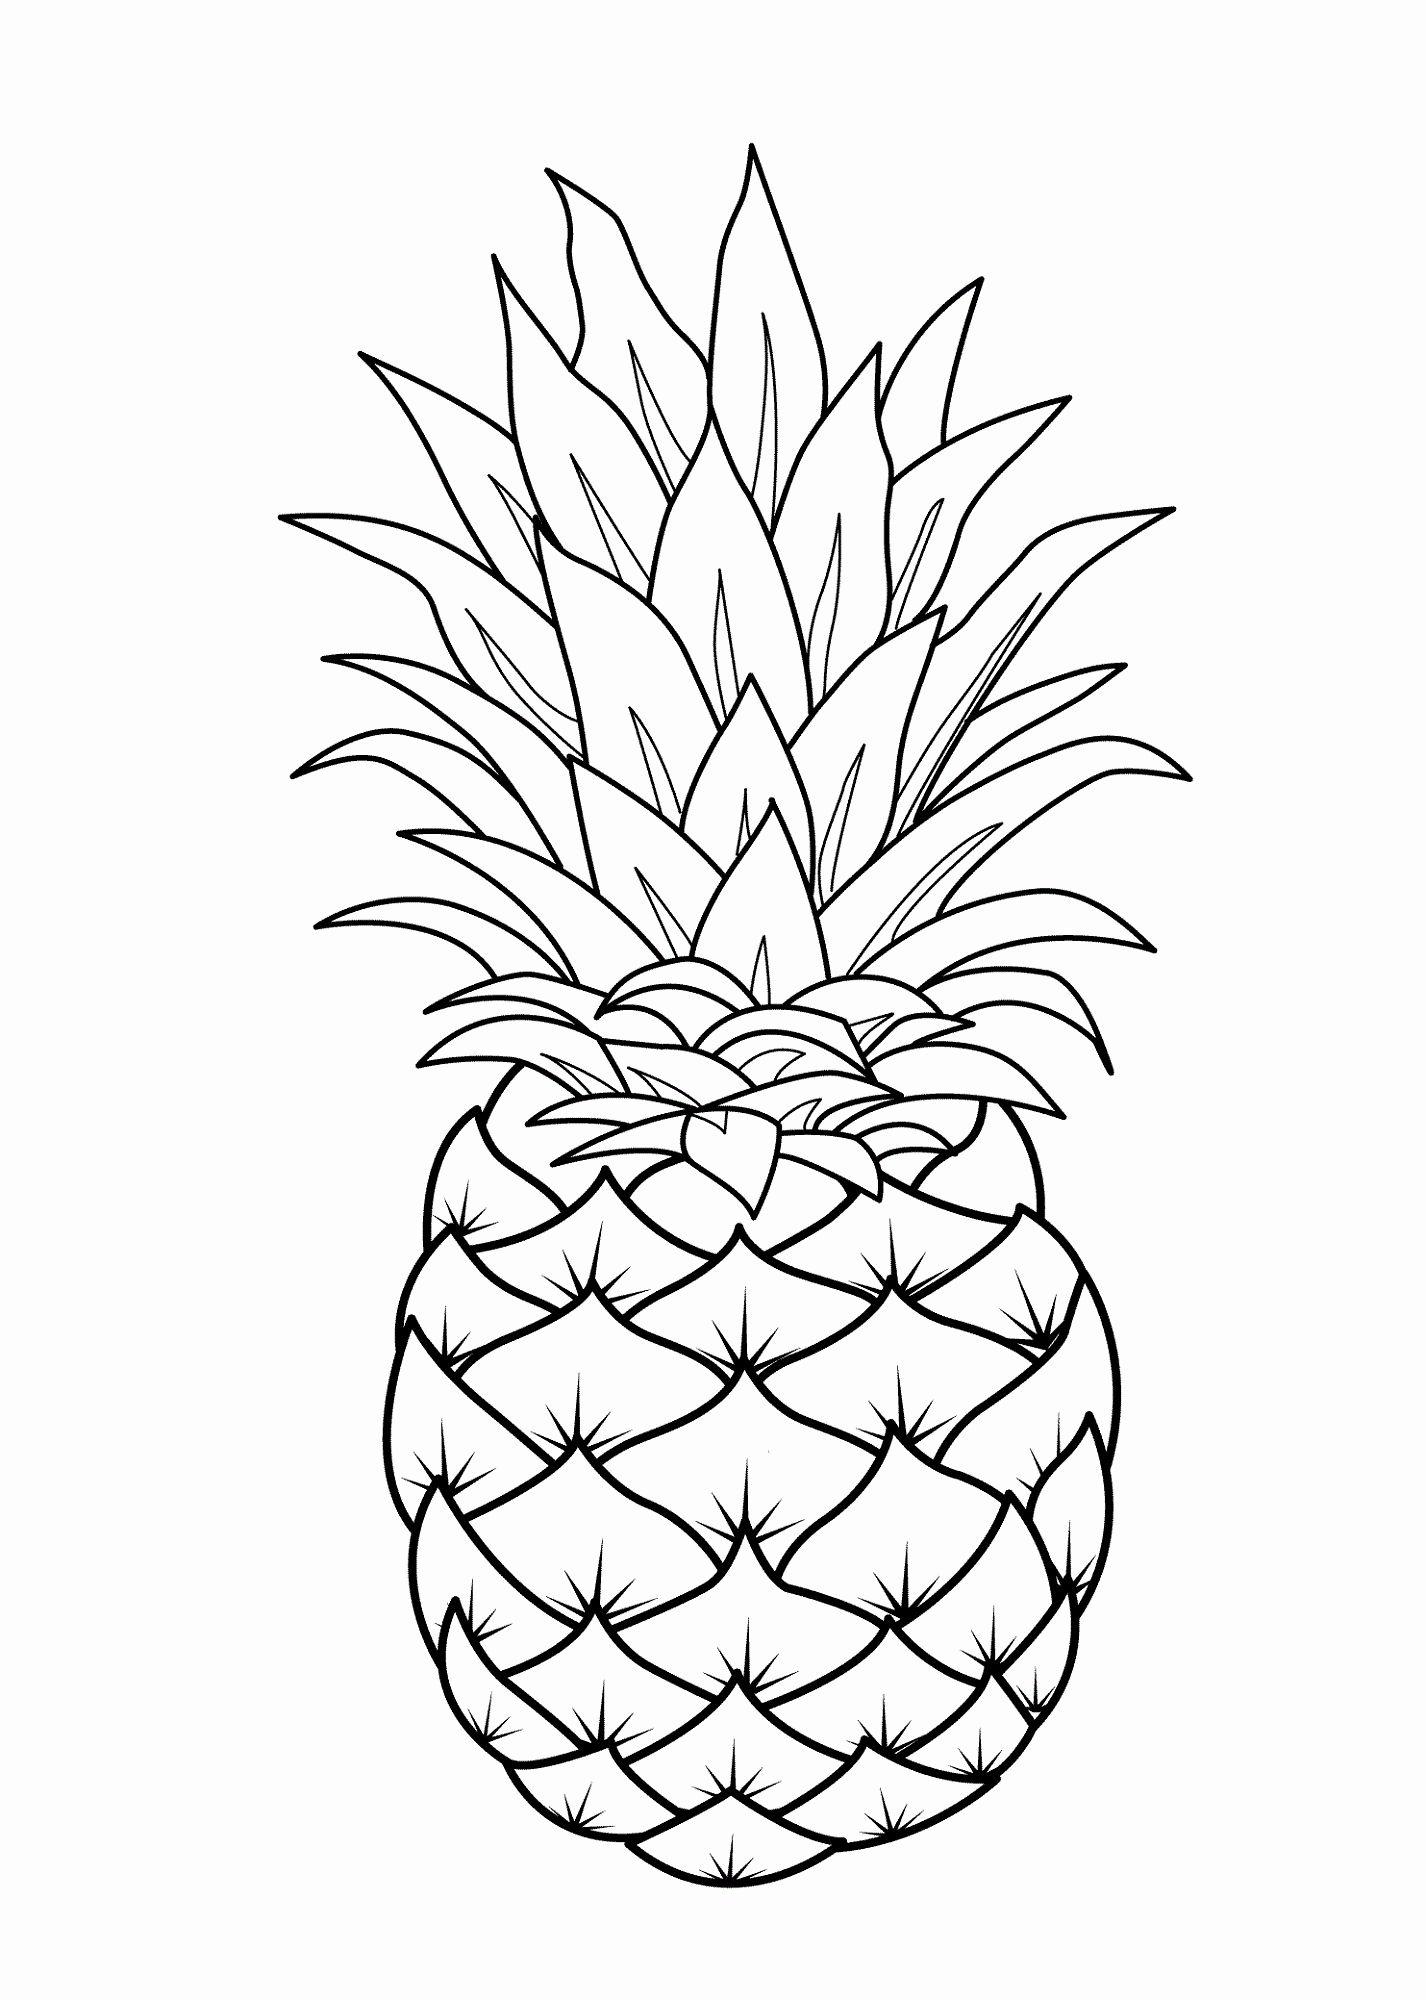 Fruits Coloring Pages Pdf nel 2020 Disegno fiori, Idee